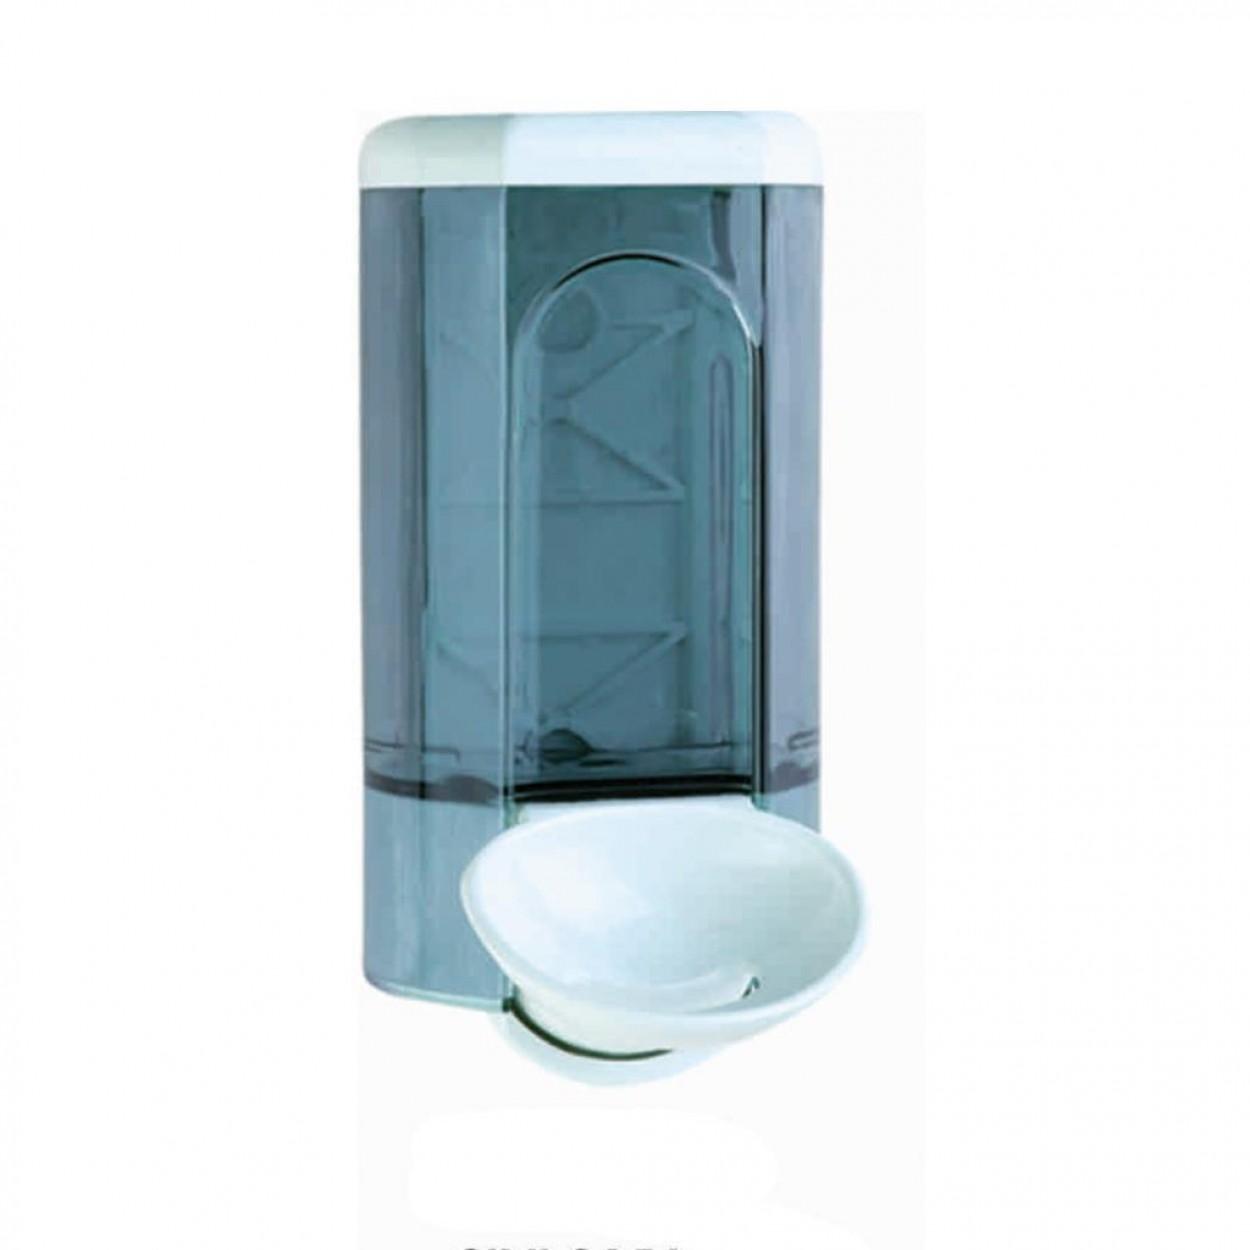 Dezenfektan Verici Dirsek Basmalı 0.6 Litre Abs Plastik